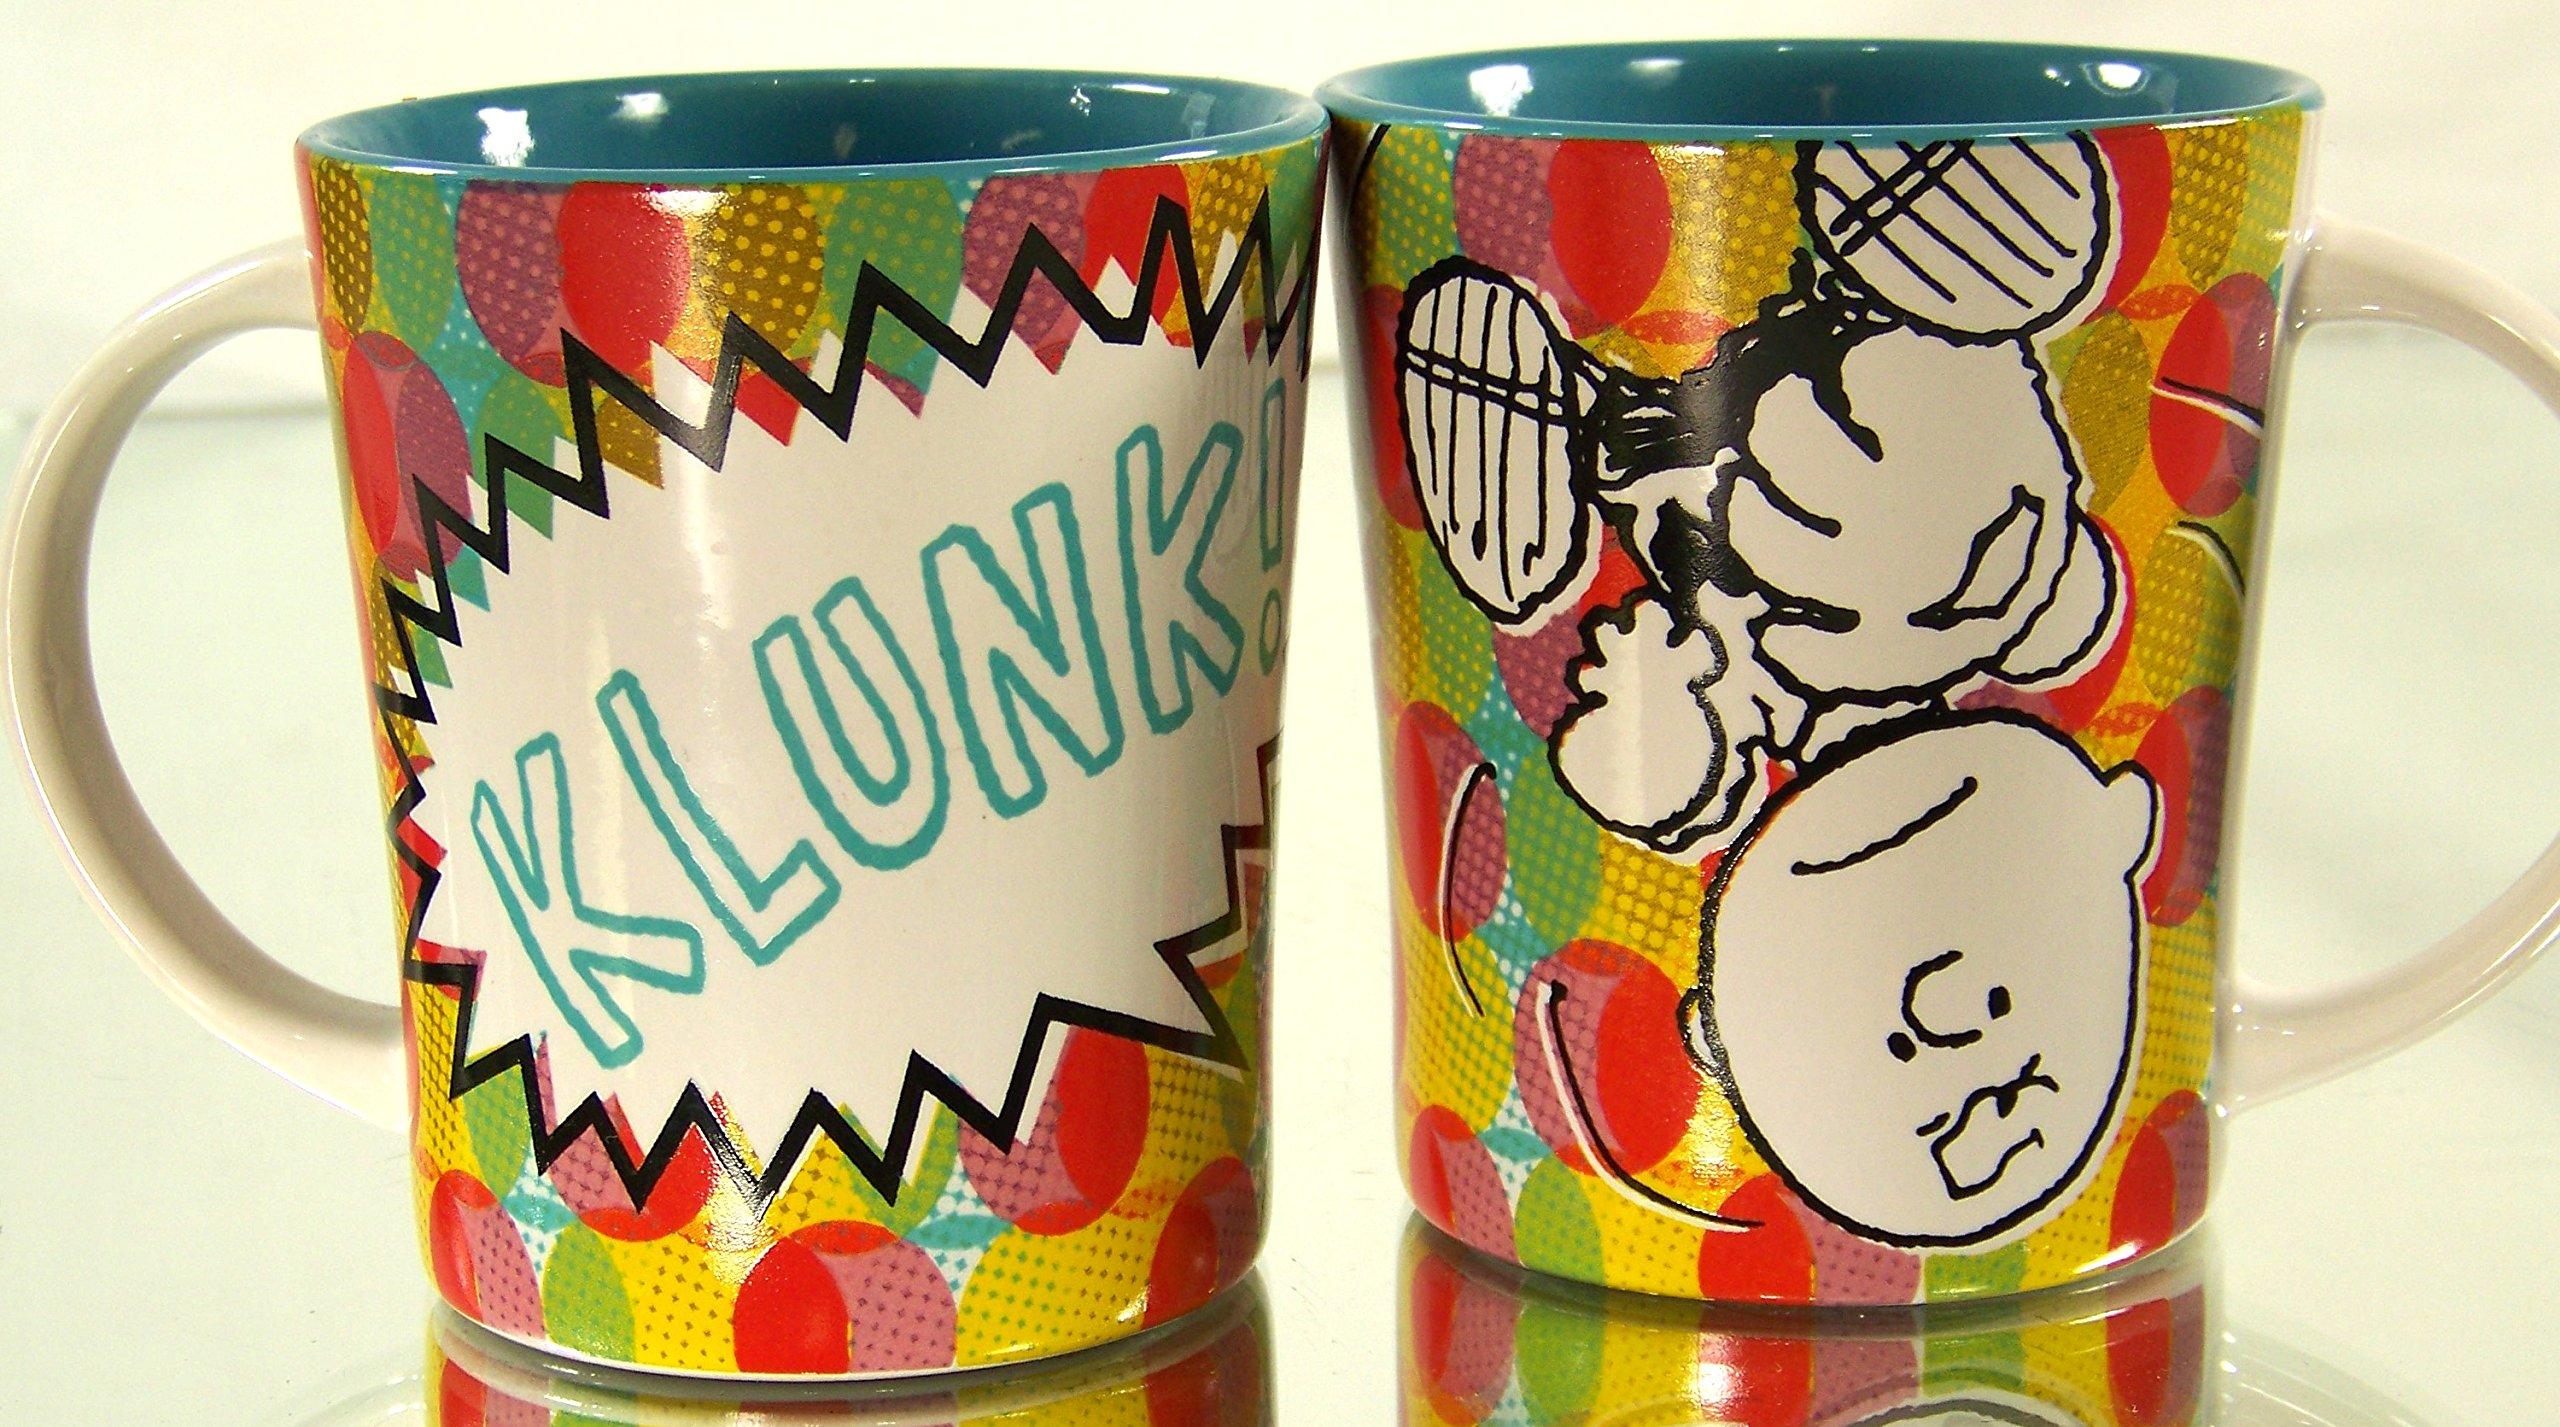 Peanuts Charlie Brown Klunk! 14 Oz Multicolor Teal Interior Ceramic Coffee or Cocoa Mug 2 Pack